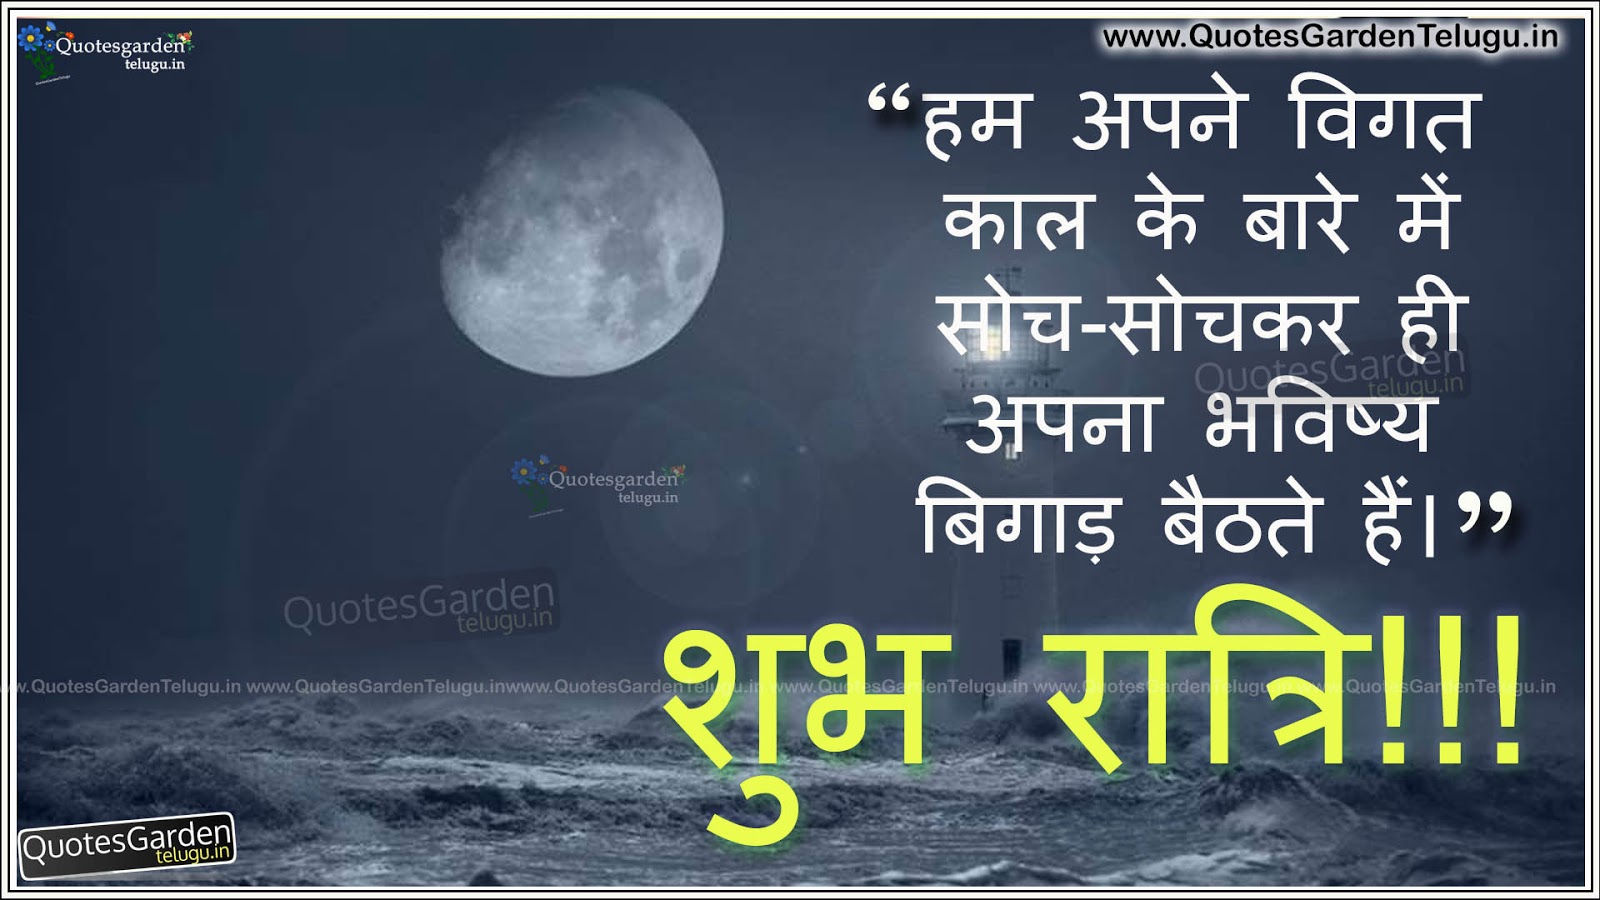 Best Good Night Greetings In Hindi With Anmol Vachan